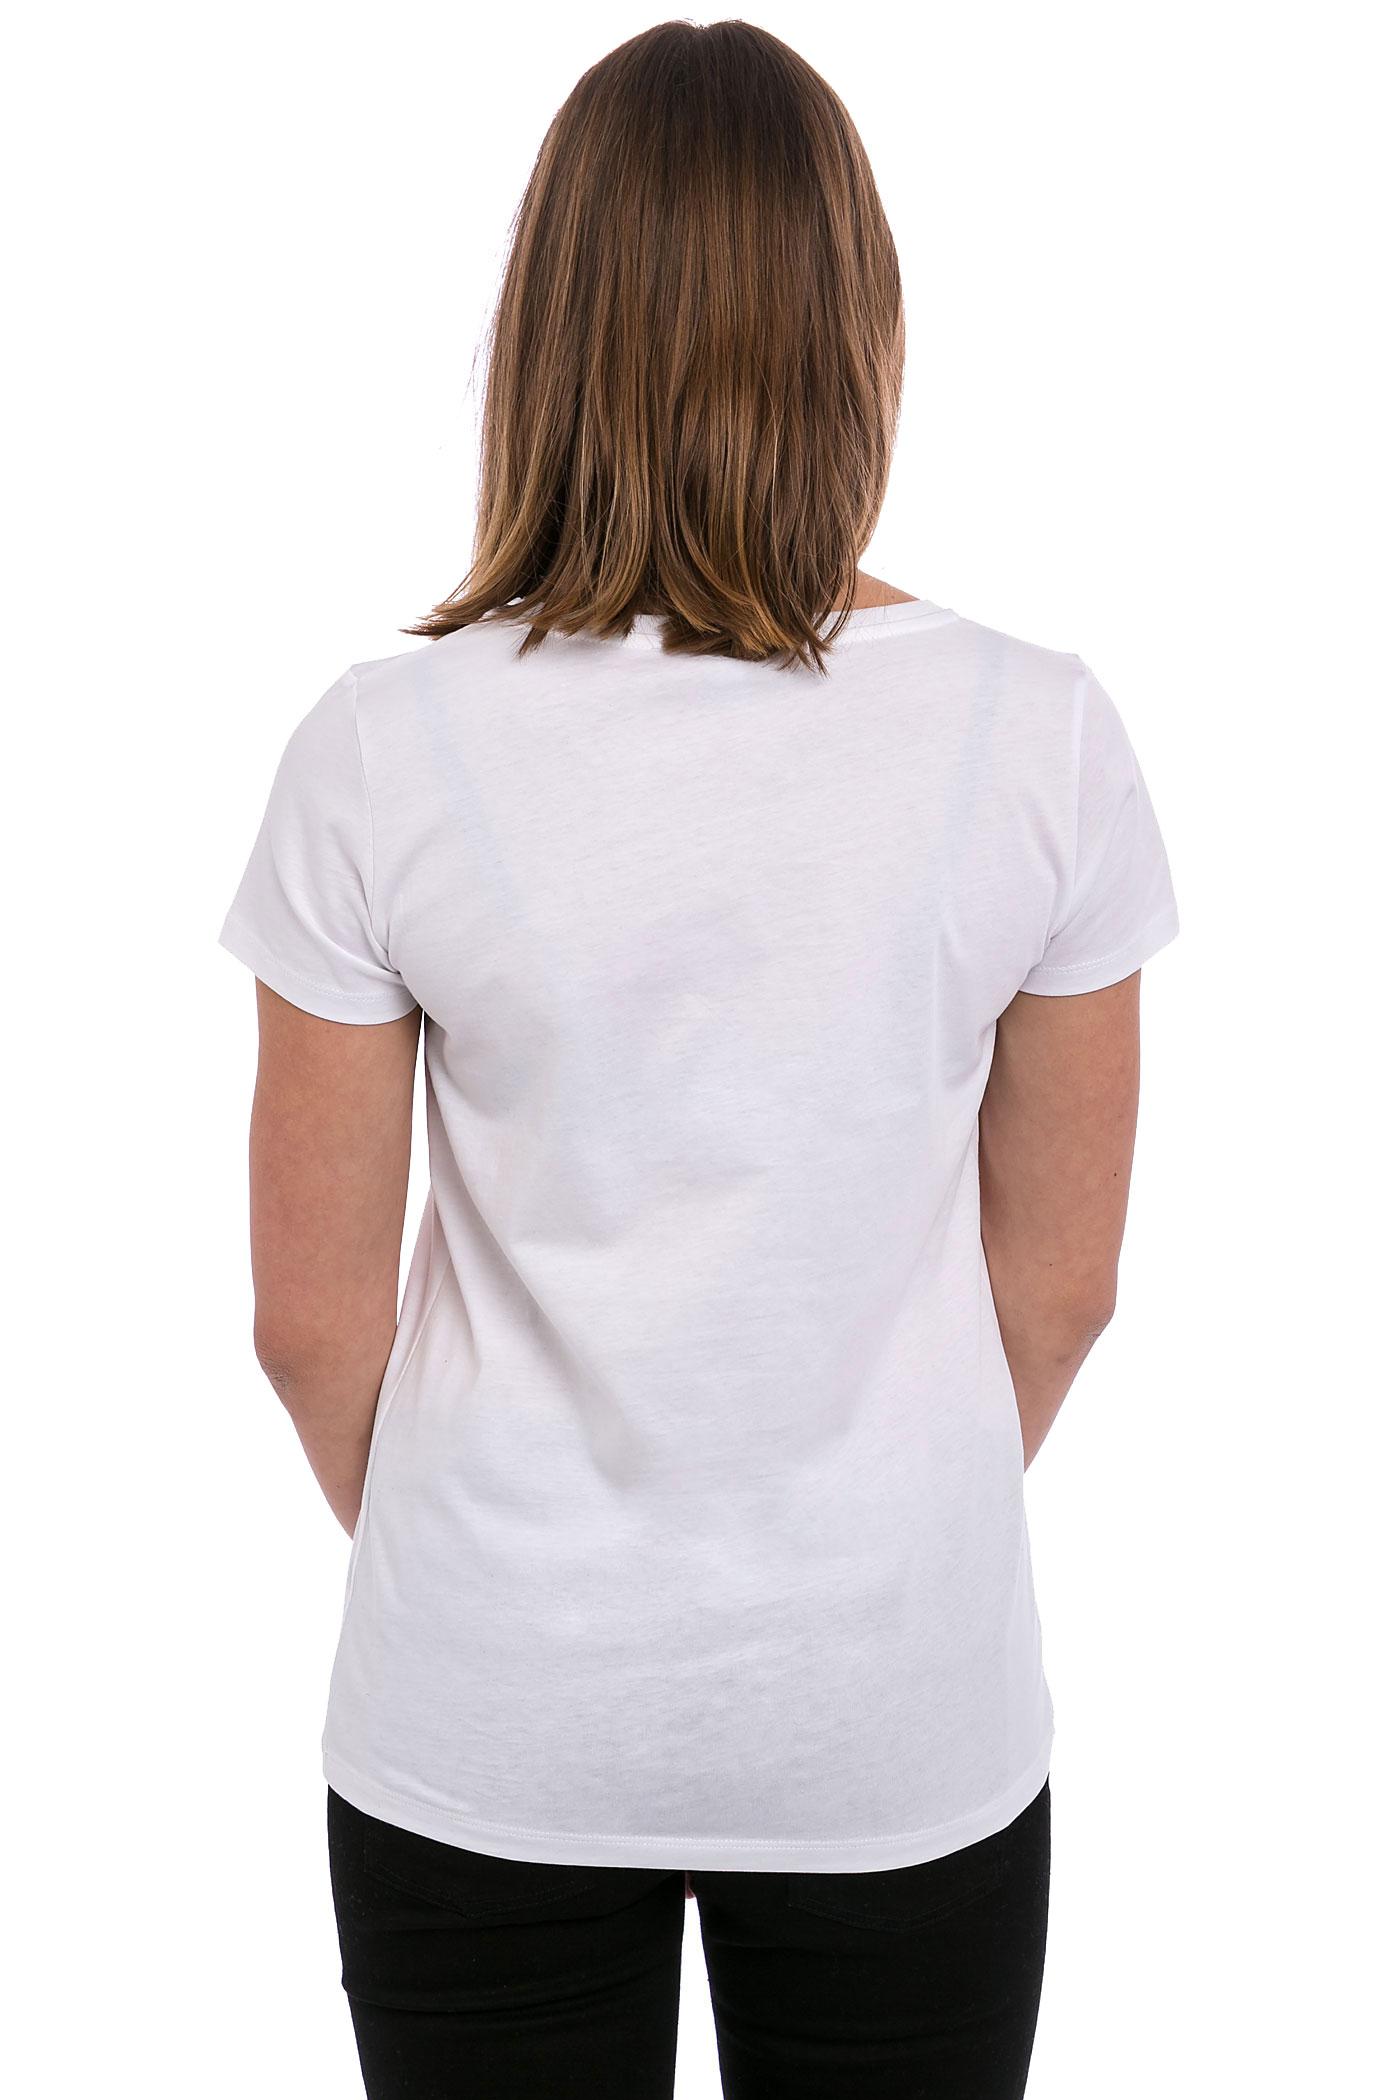 iriedaily easypeacy t shirt women white kaufen bei. Black Bedroom Furniture Sets. Home Design Ideas